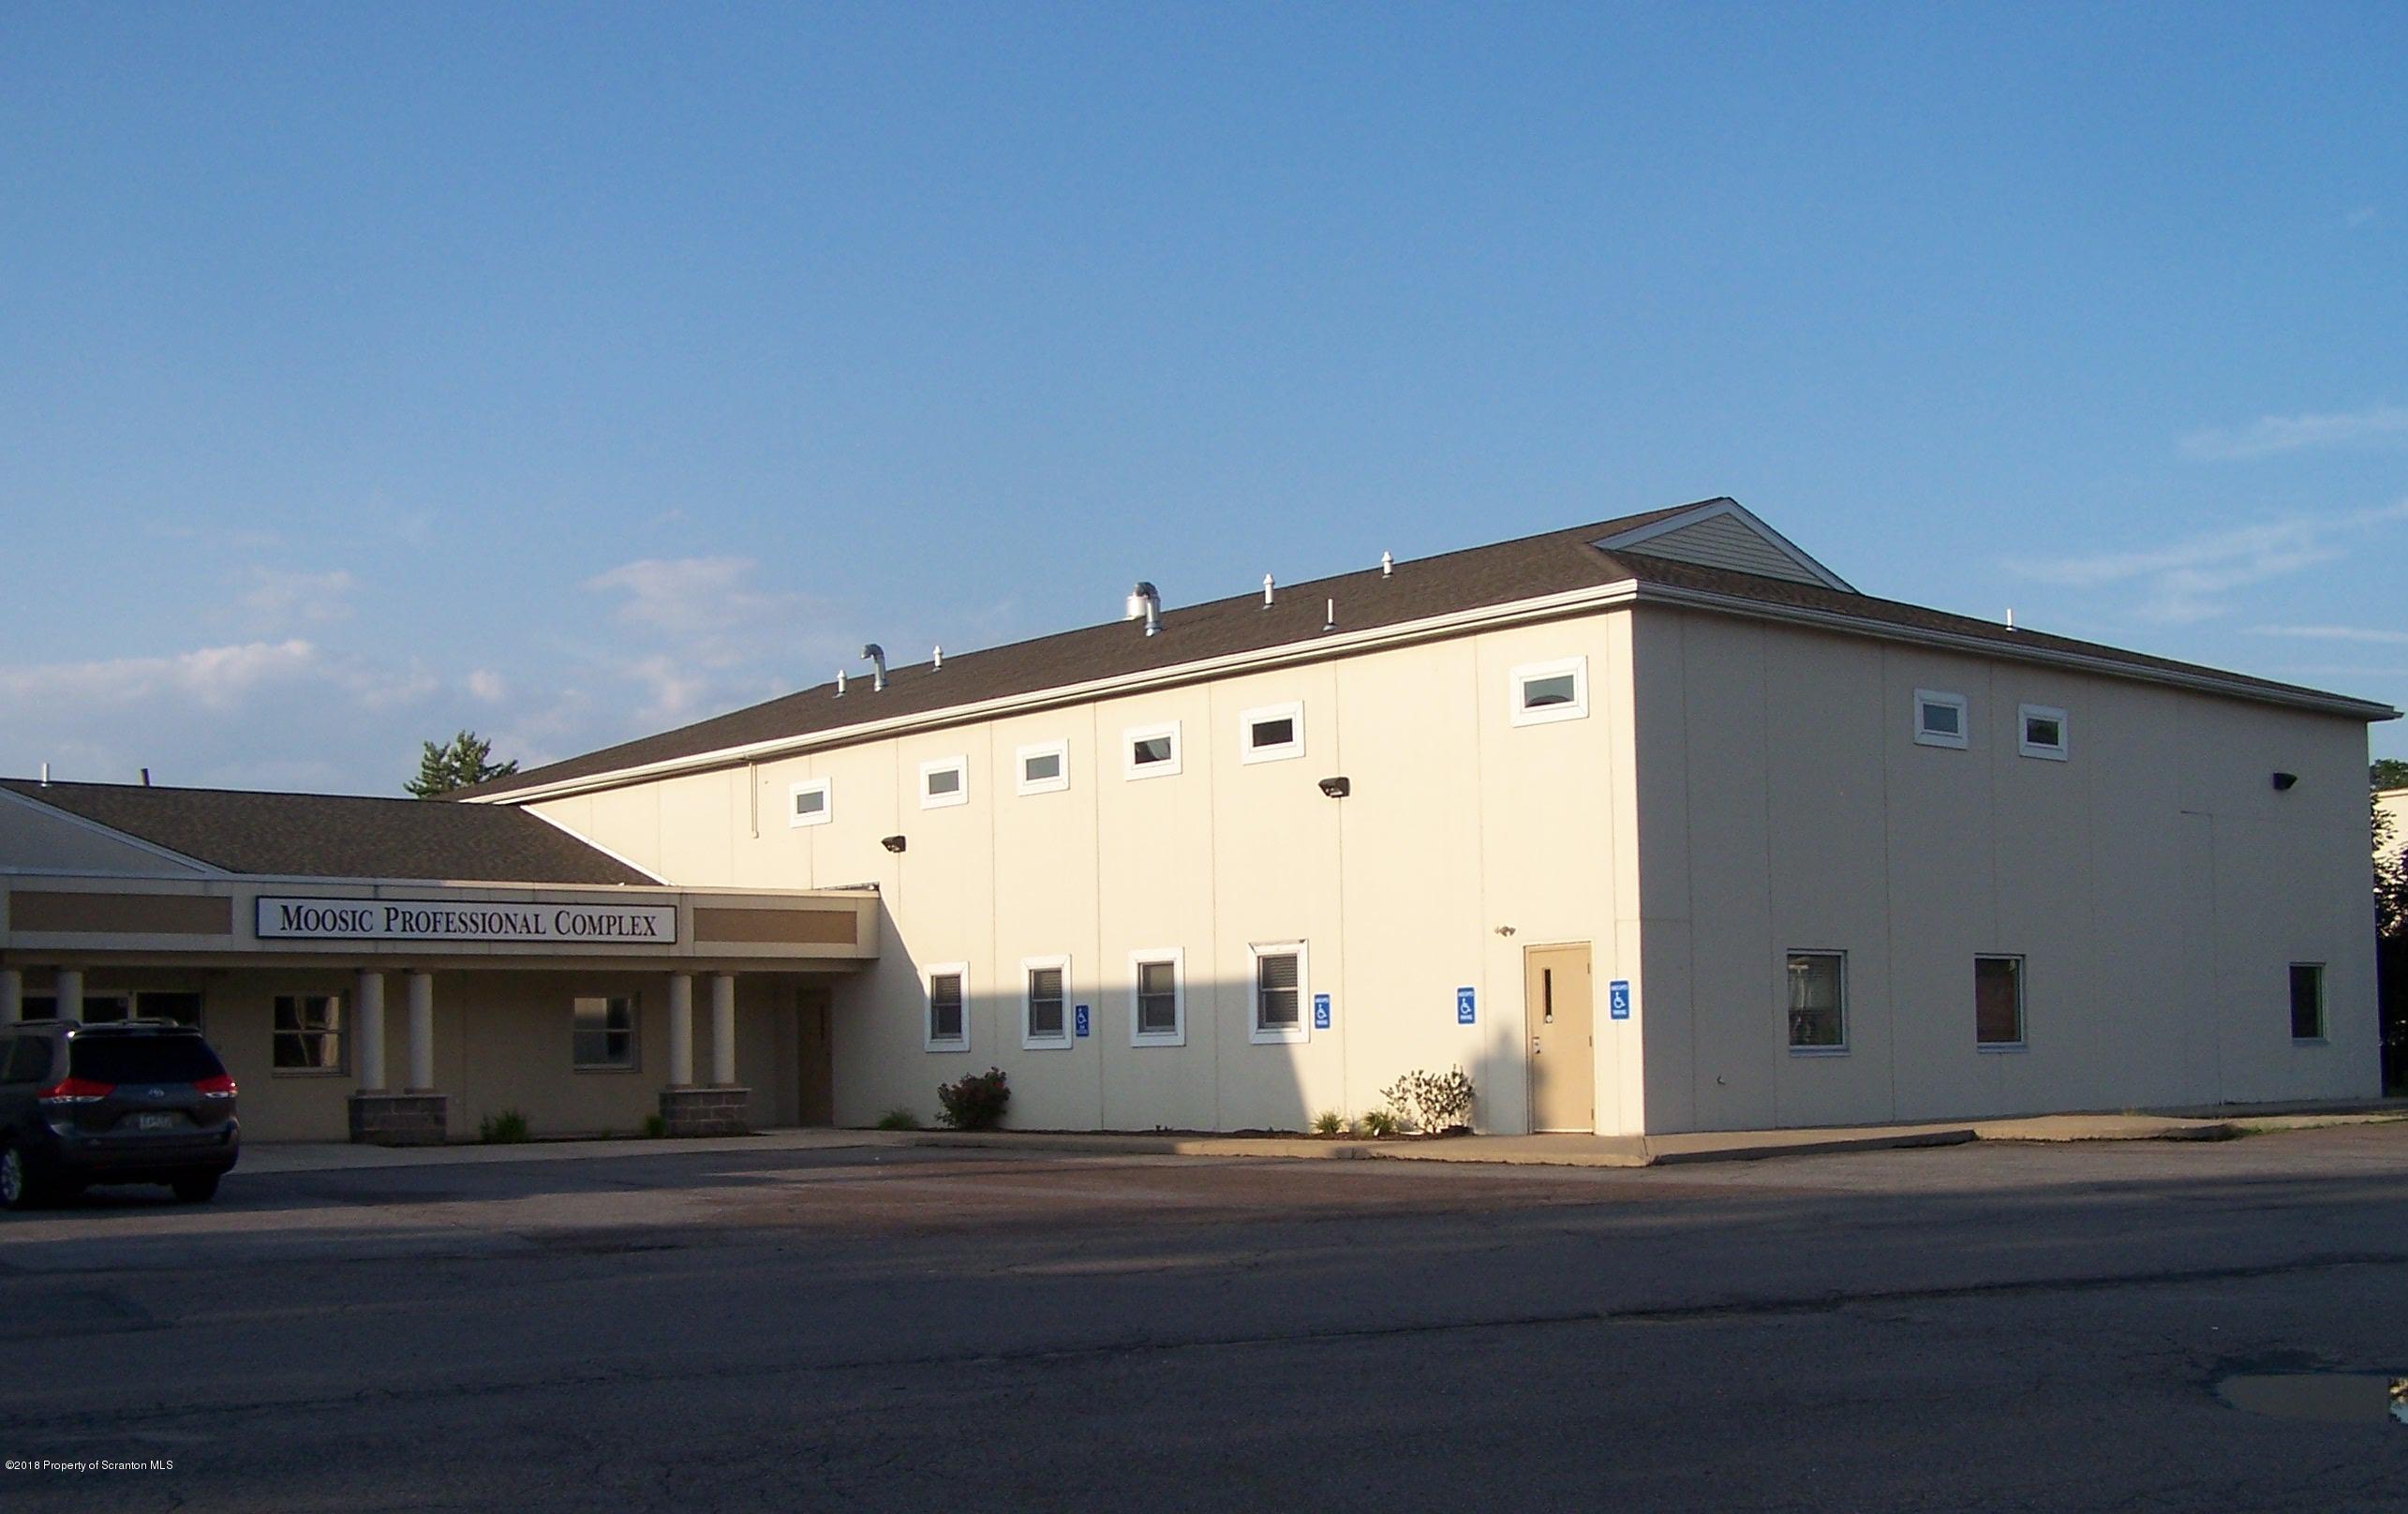 532 Main St, Moosic, Pennsylvania 18507, ,1 BathroomBathrooms,Commercial,For Lease,Main,18-3610